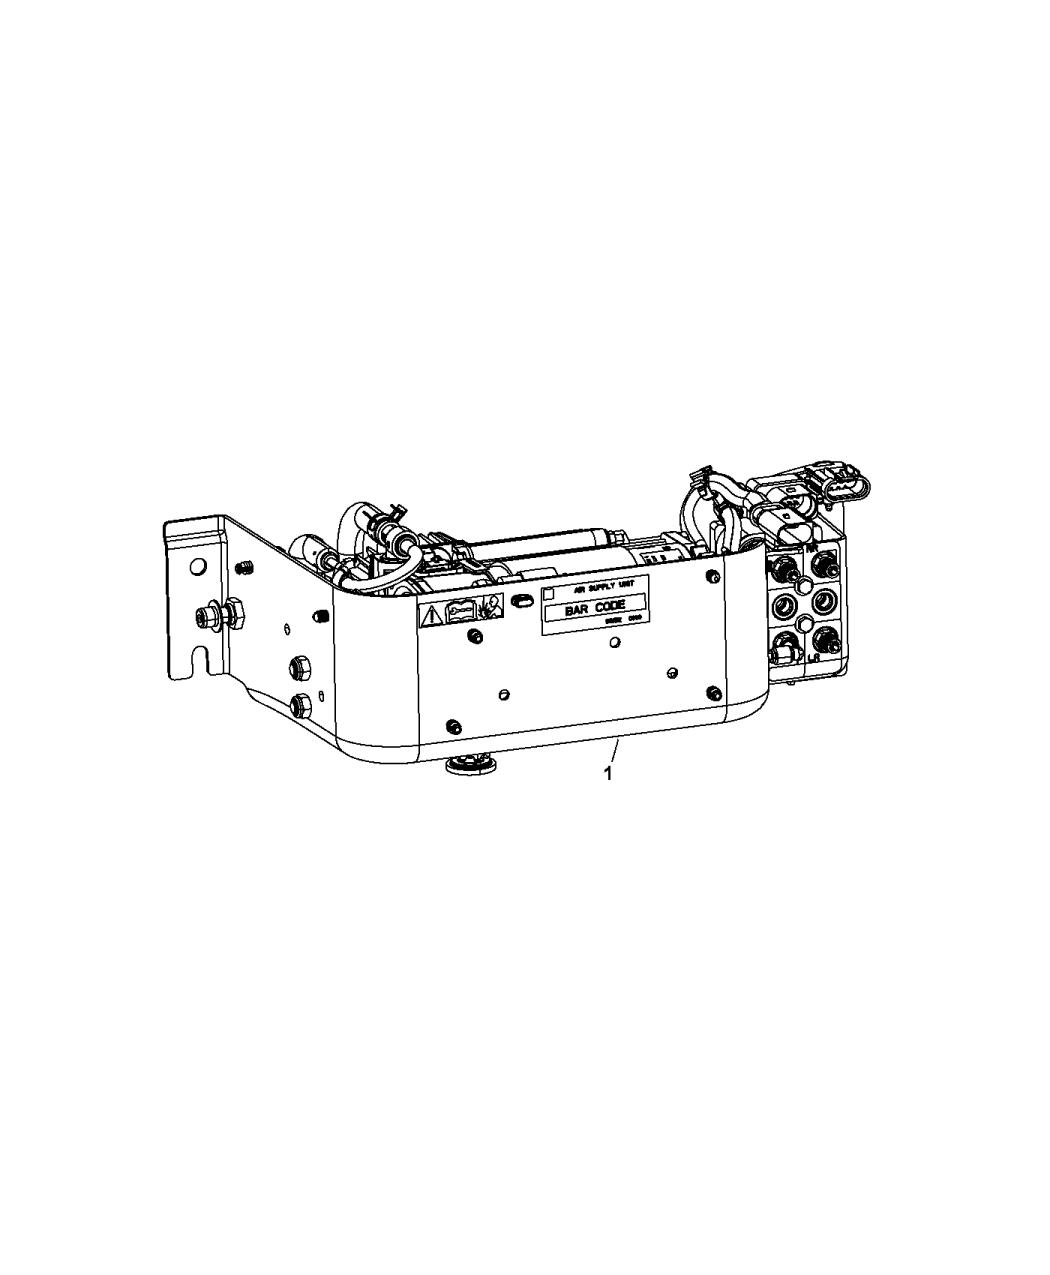 2016 Ram 3500 Pickup Air Suspension Compressor Assembly